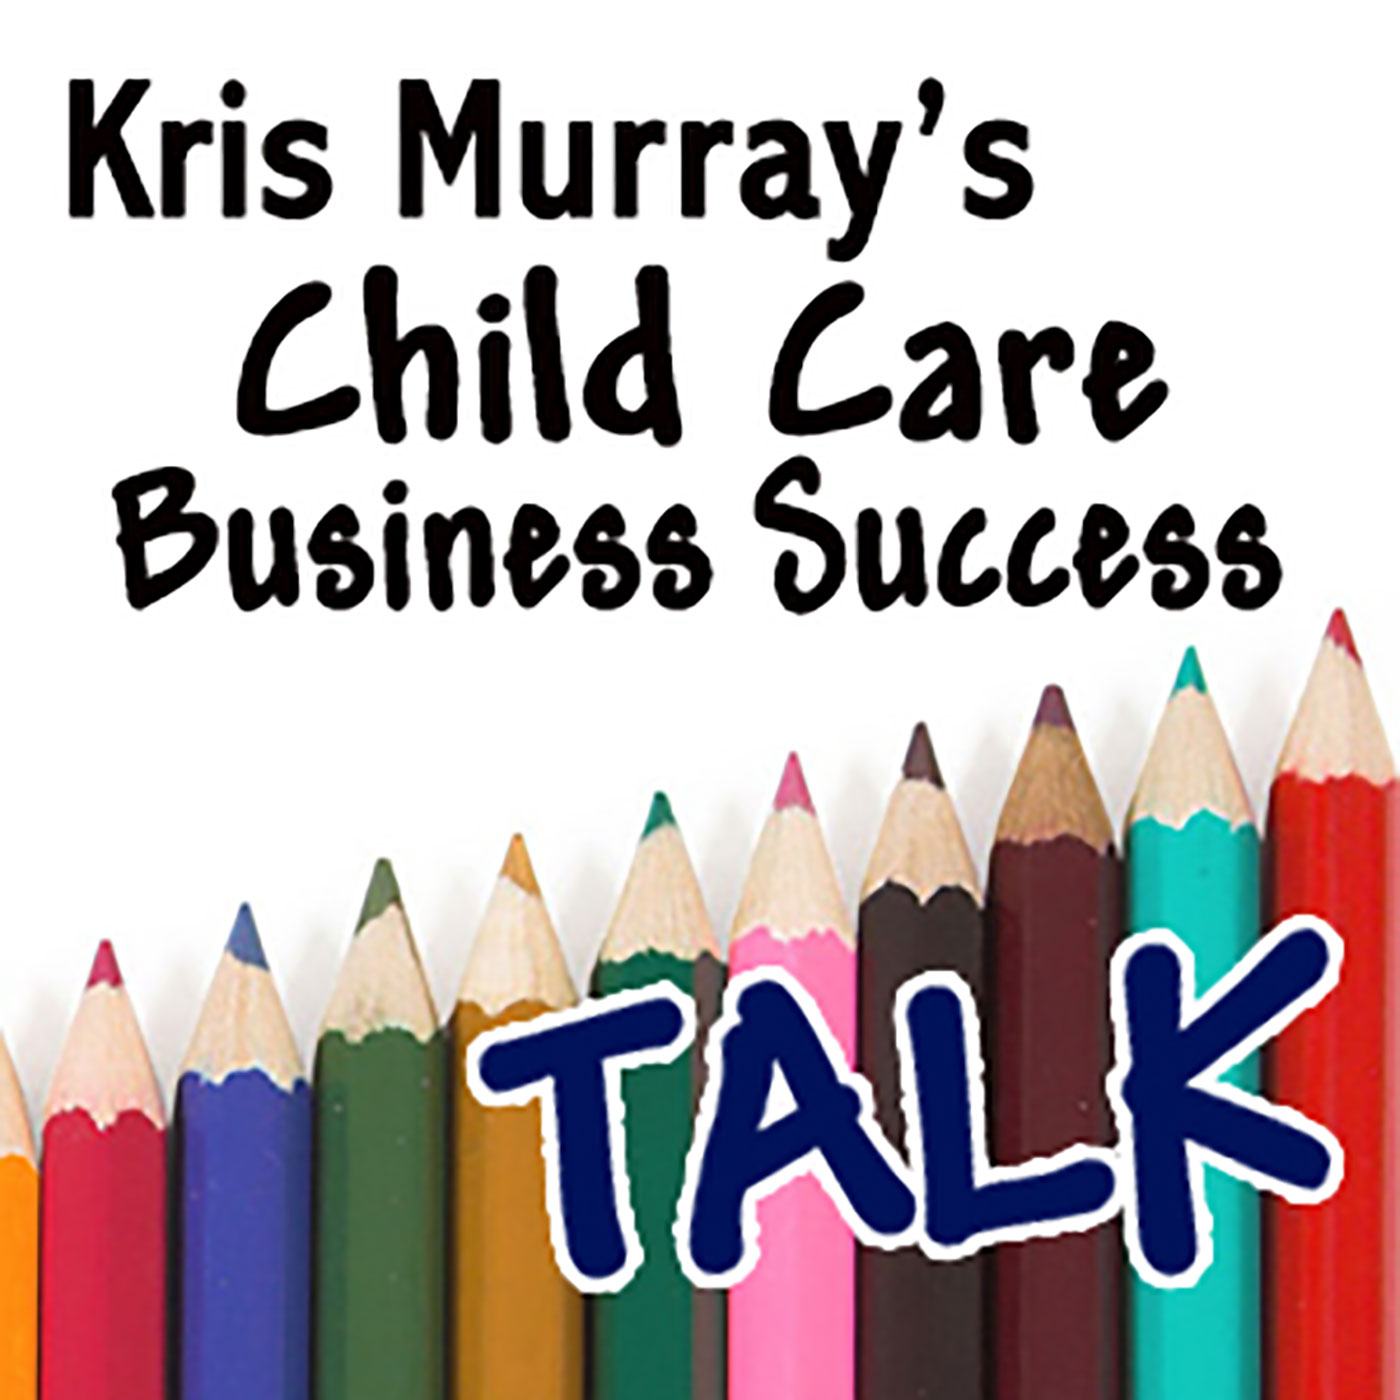 Kris Murray's Child Care Business Success Talk